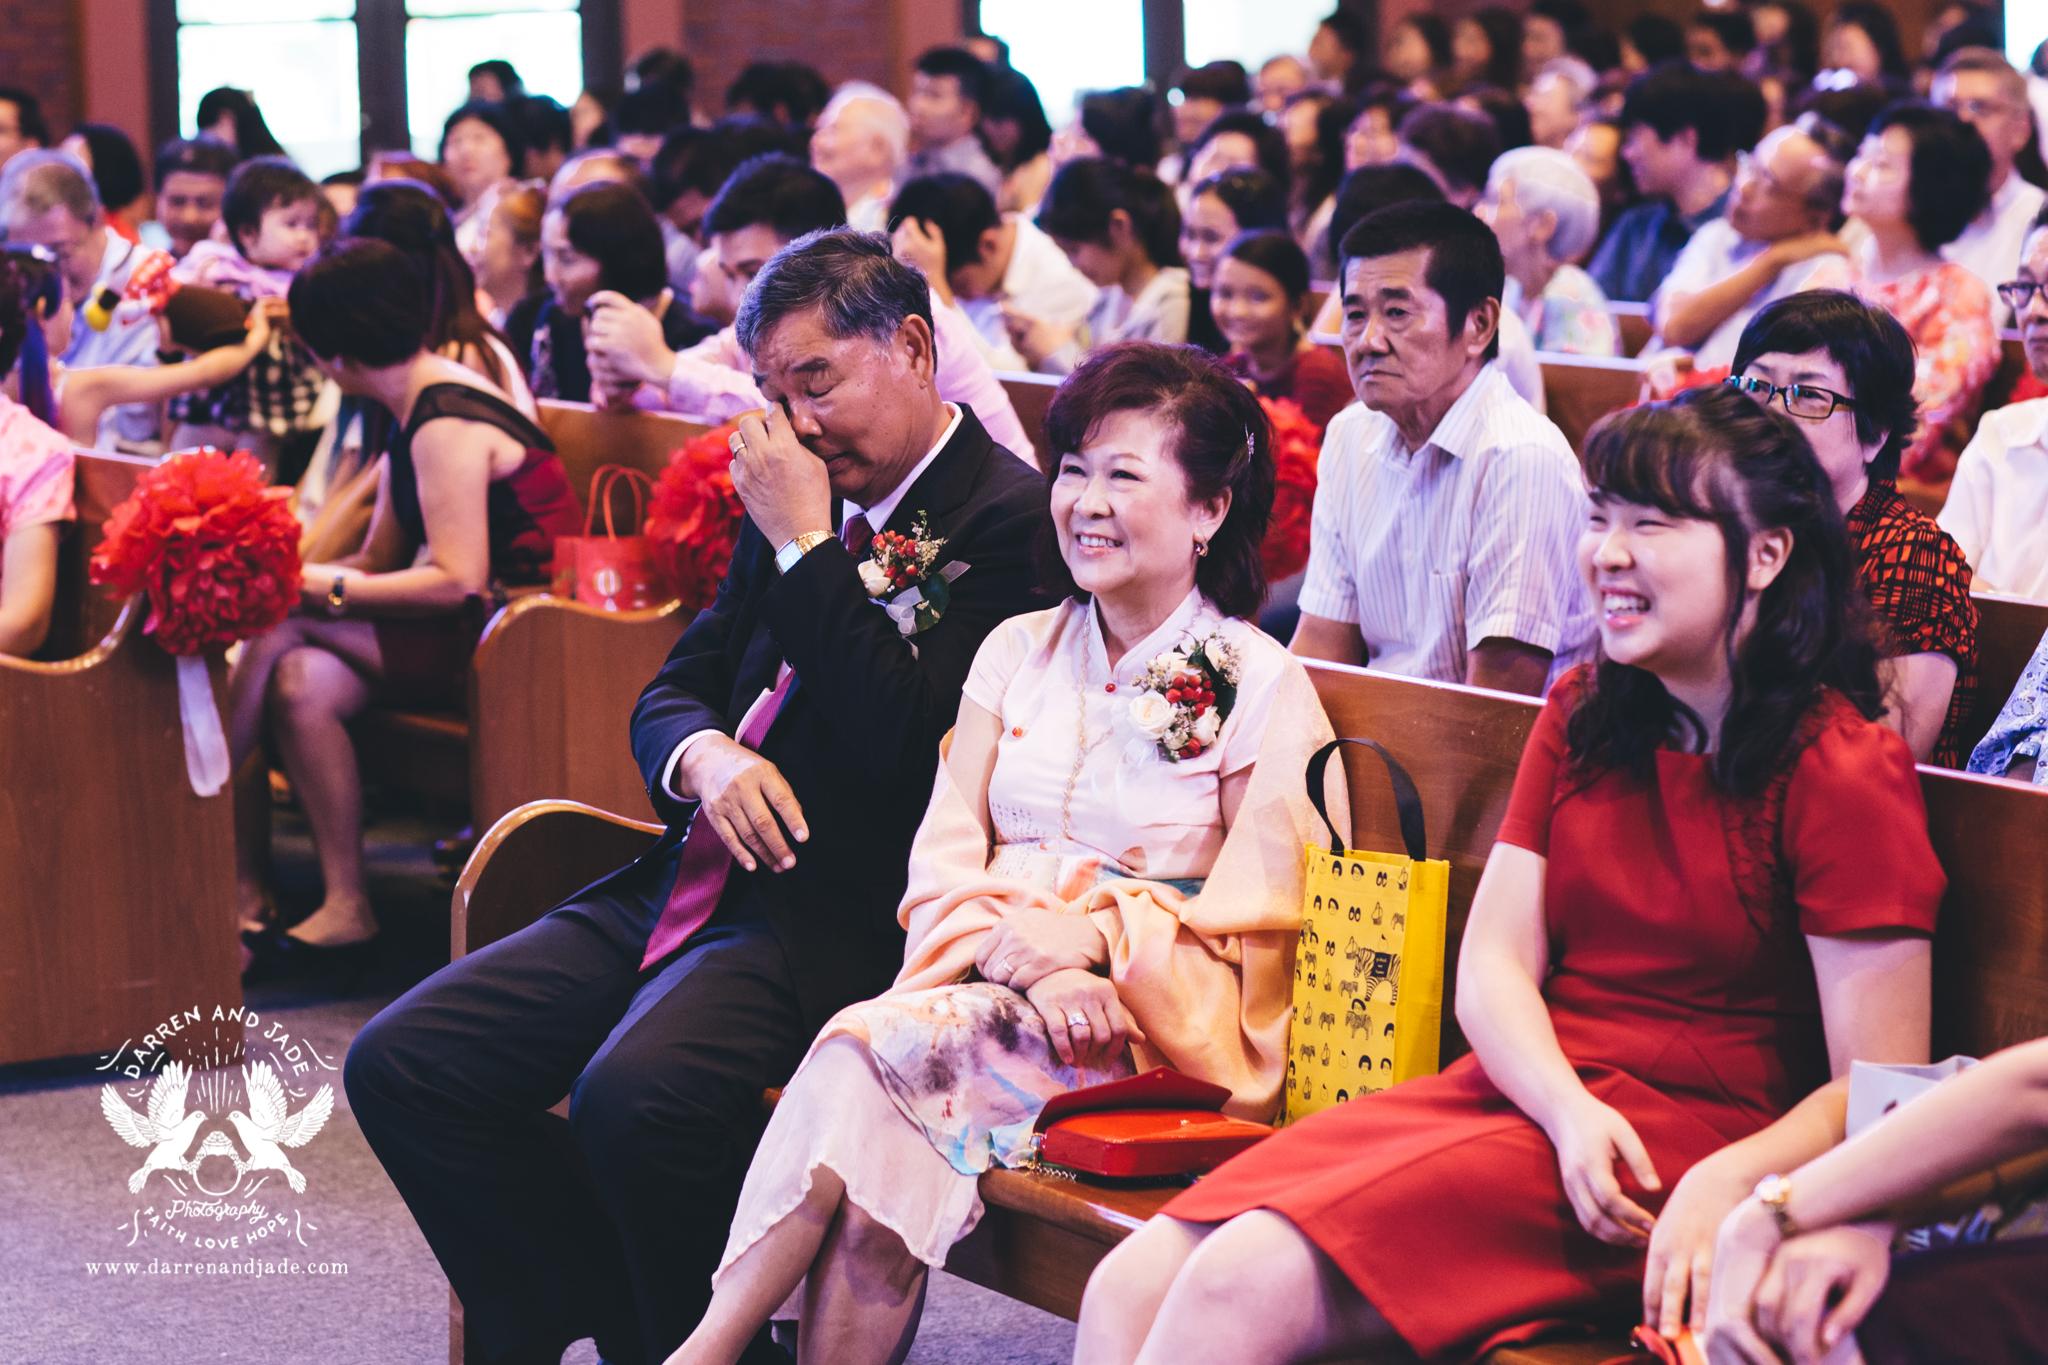 Bel & Emans - Wedding - Blog (69 of 69).jpg